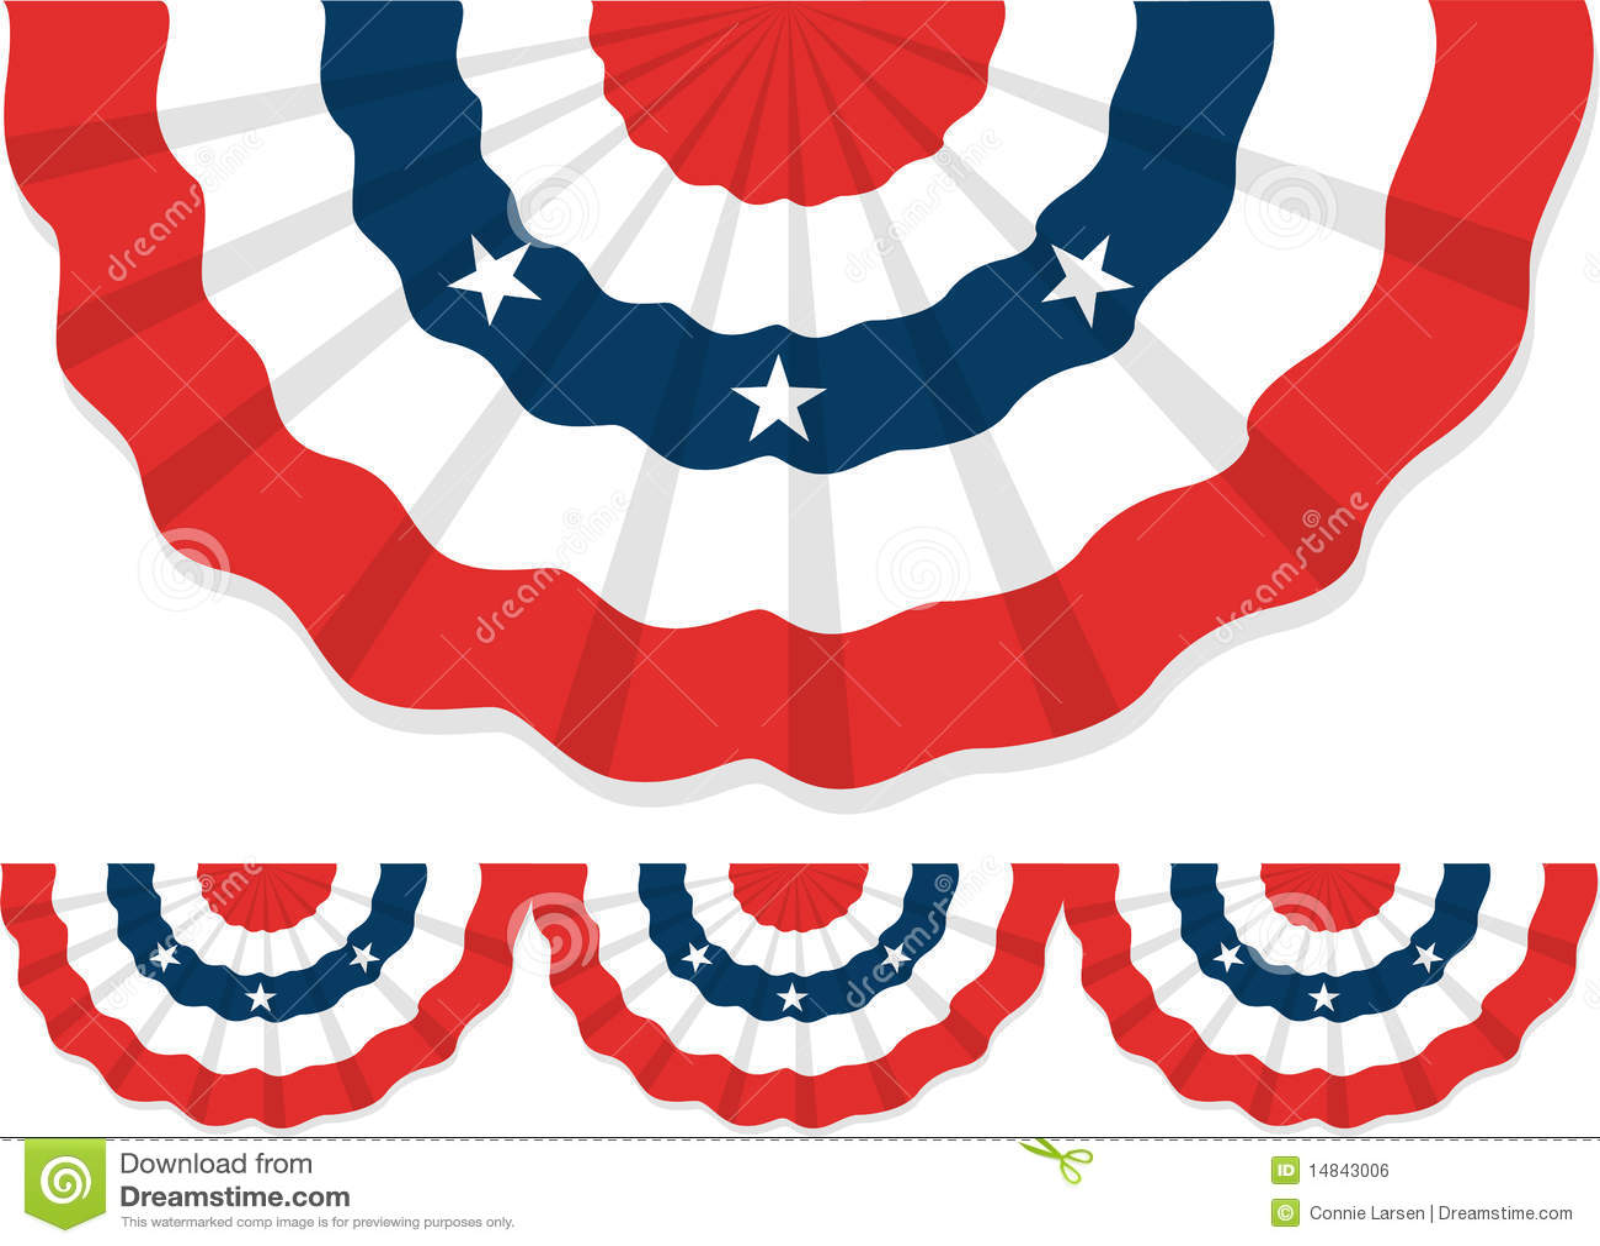 Patriotic Bunting/ai Royalty Free Stock Image - Image: 14843006